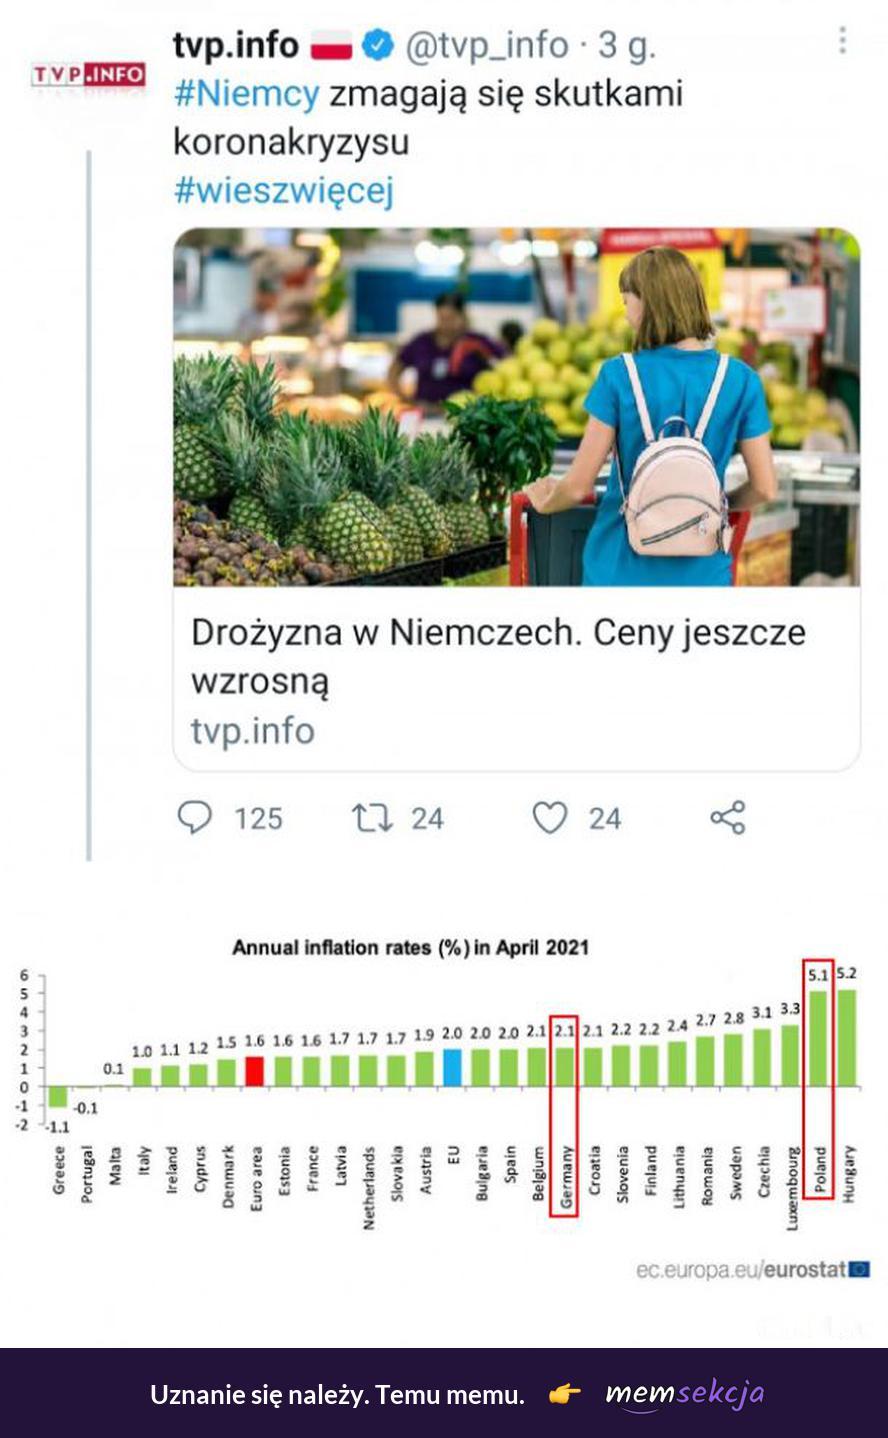 Niemiecka inflacja vs Polska inflacja. Memy. Polska. Niemcy. Tvp. Propaganda